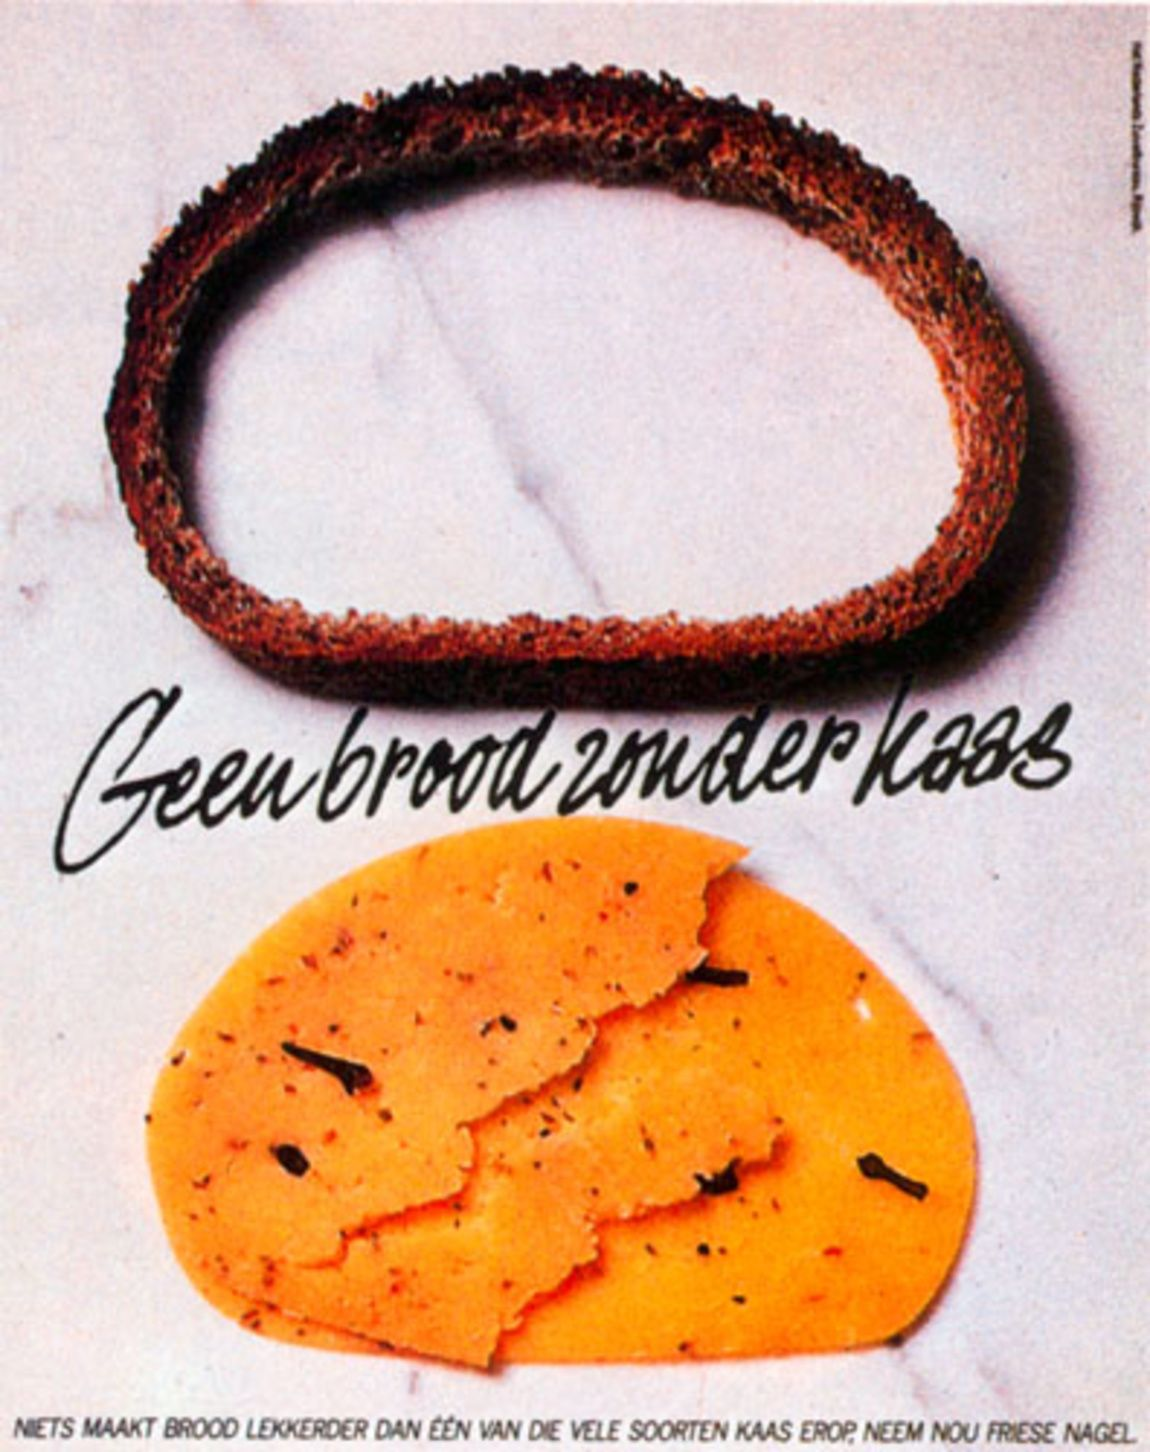 Read more: https://www.luerzersarchive.com/en/magazine/print-detail/17752.html Not bread, but cheese. Tags: Hans Kroeskamp,Prad, Amsterdam,Nederlands Zuivelburo,Cees Van Asperen,Klaas Slooten